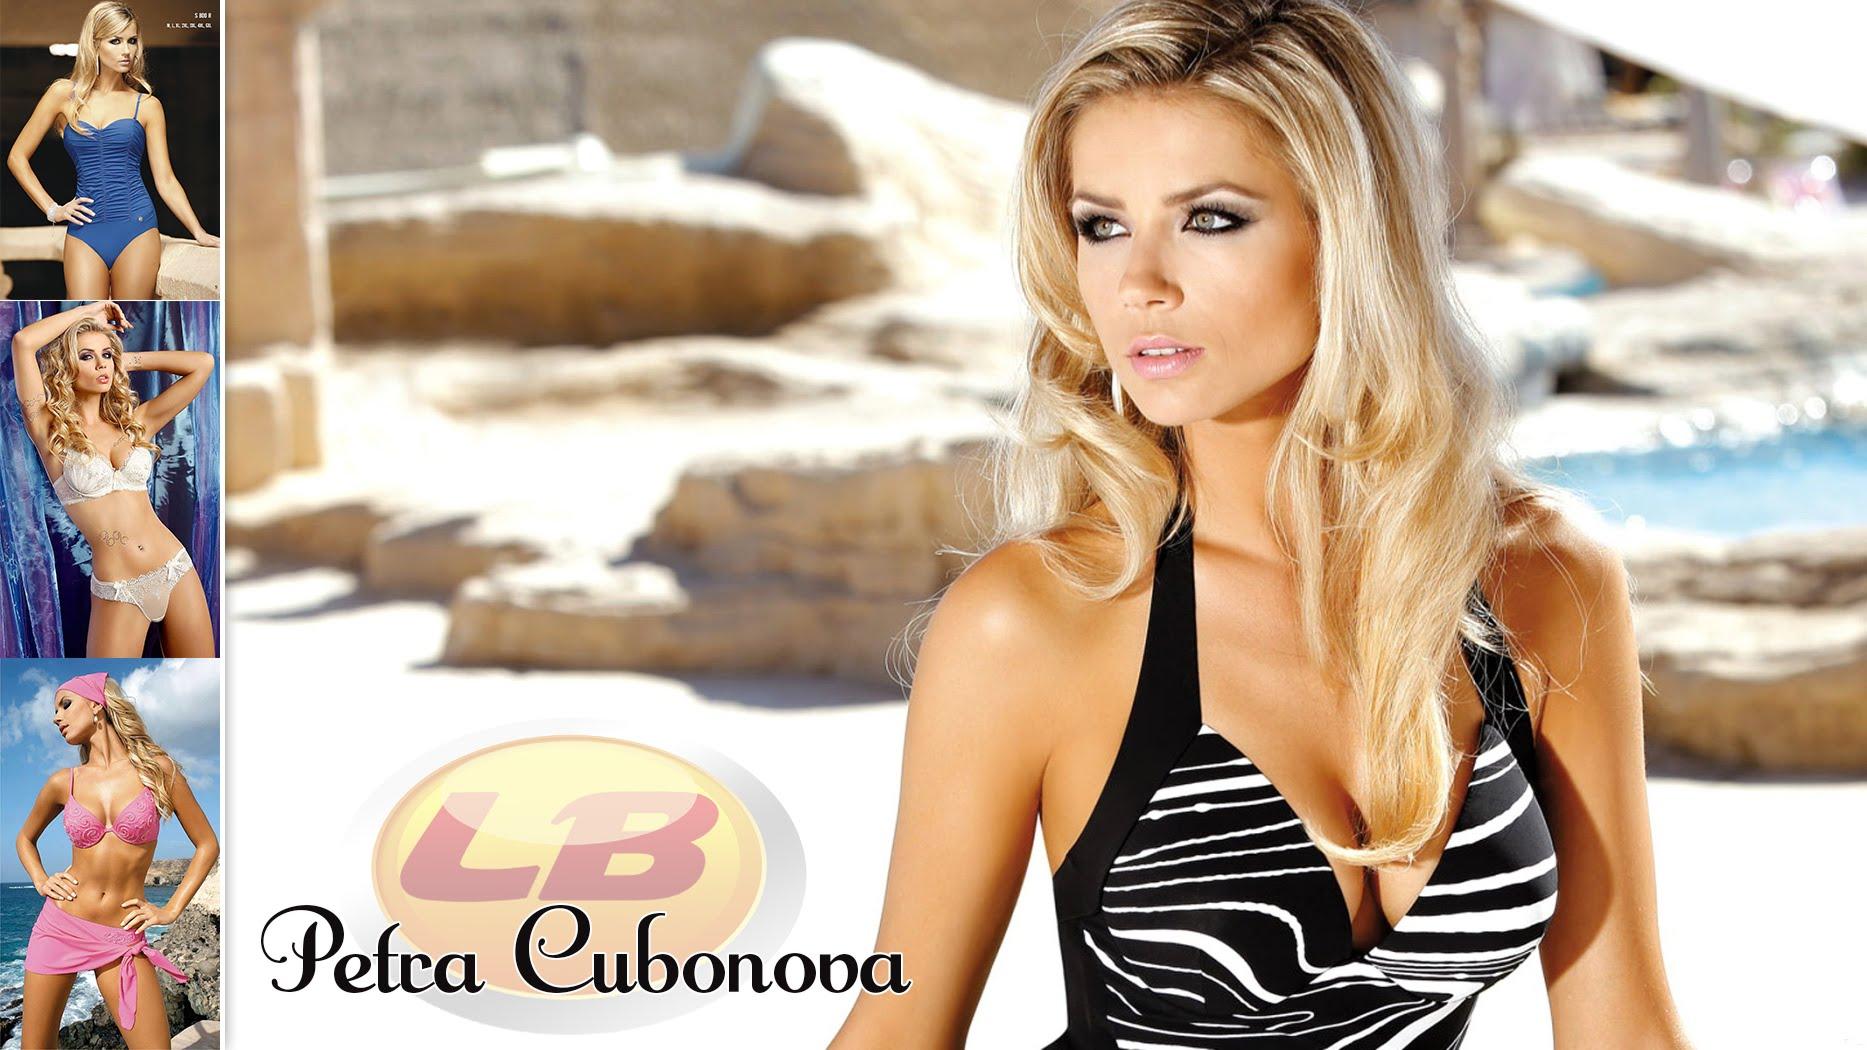 Petra Cubonova High Quality Background on Wallpapers Vista